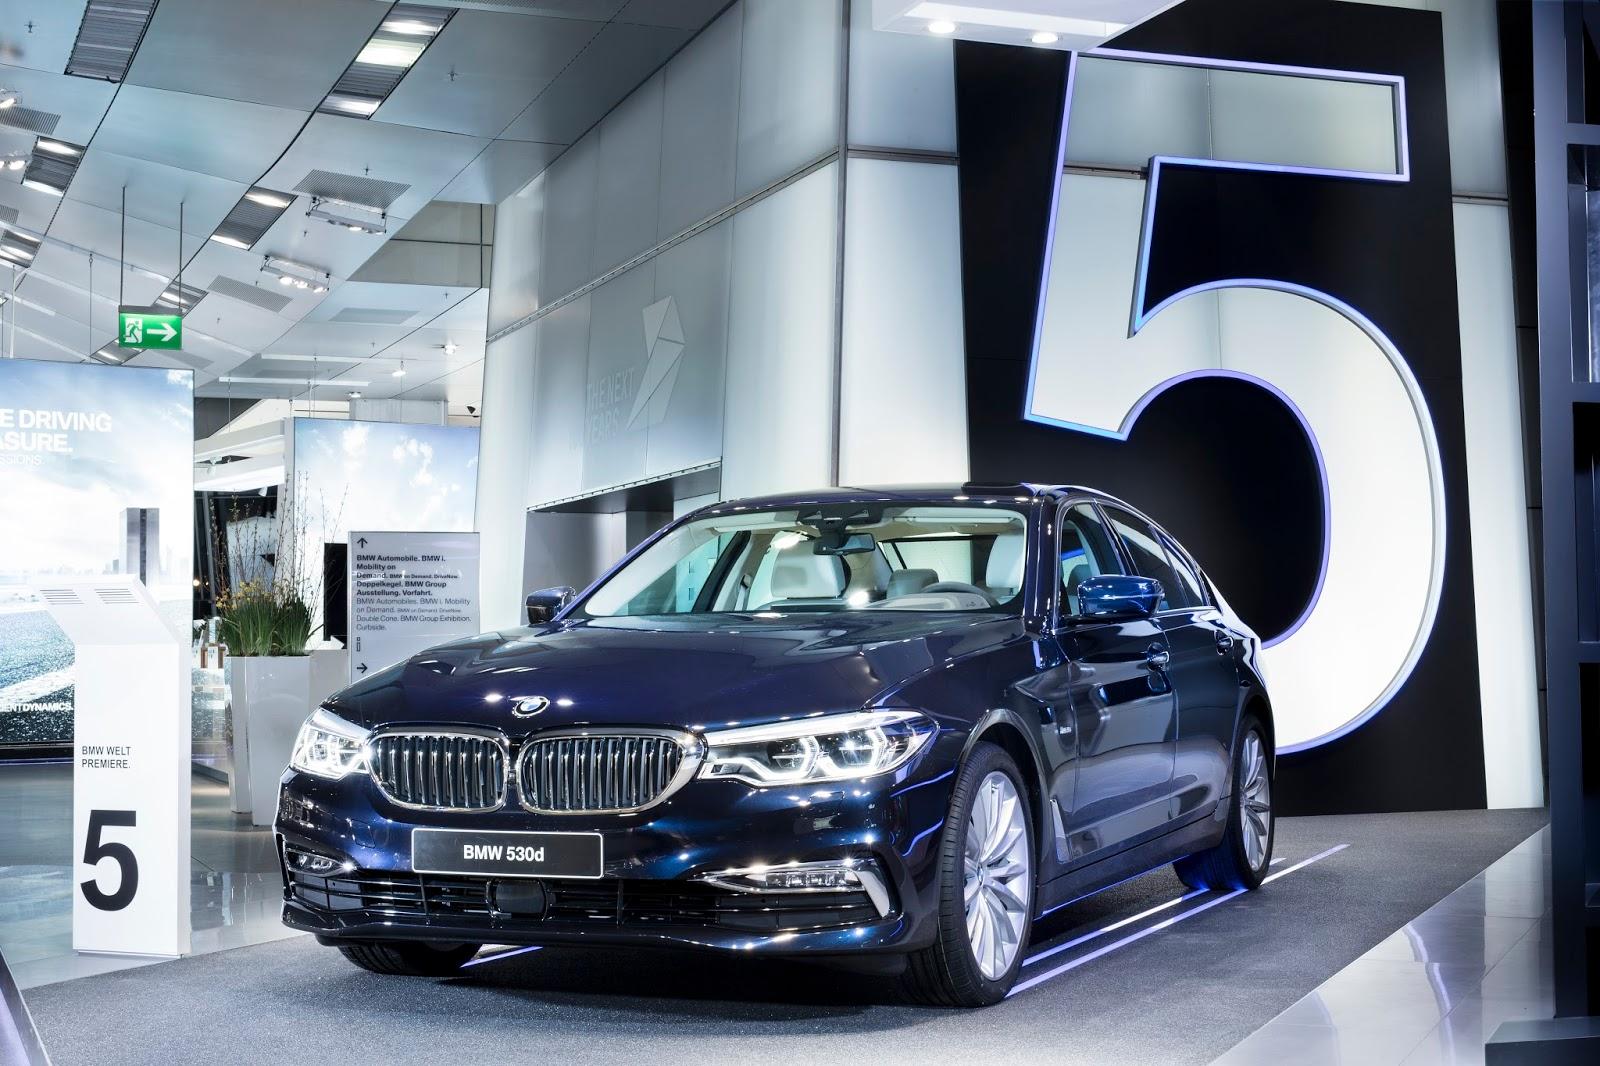 P90248628 highRes the new bmw 5 series Δες την ταινία The Escape, με πρωταγωνιστή την νέα BMW Σειρά 5 BMW, BMW 5, Fun, movie, movie cars, videos, Λανσάρισμα